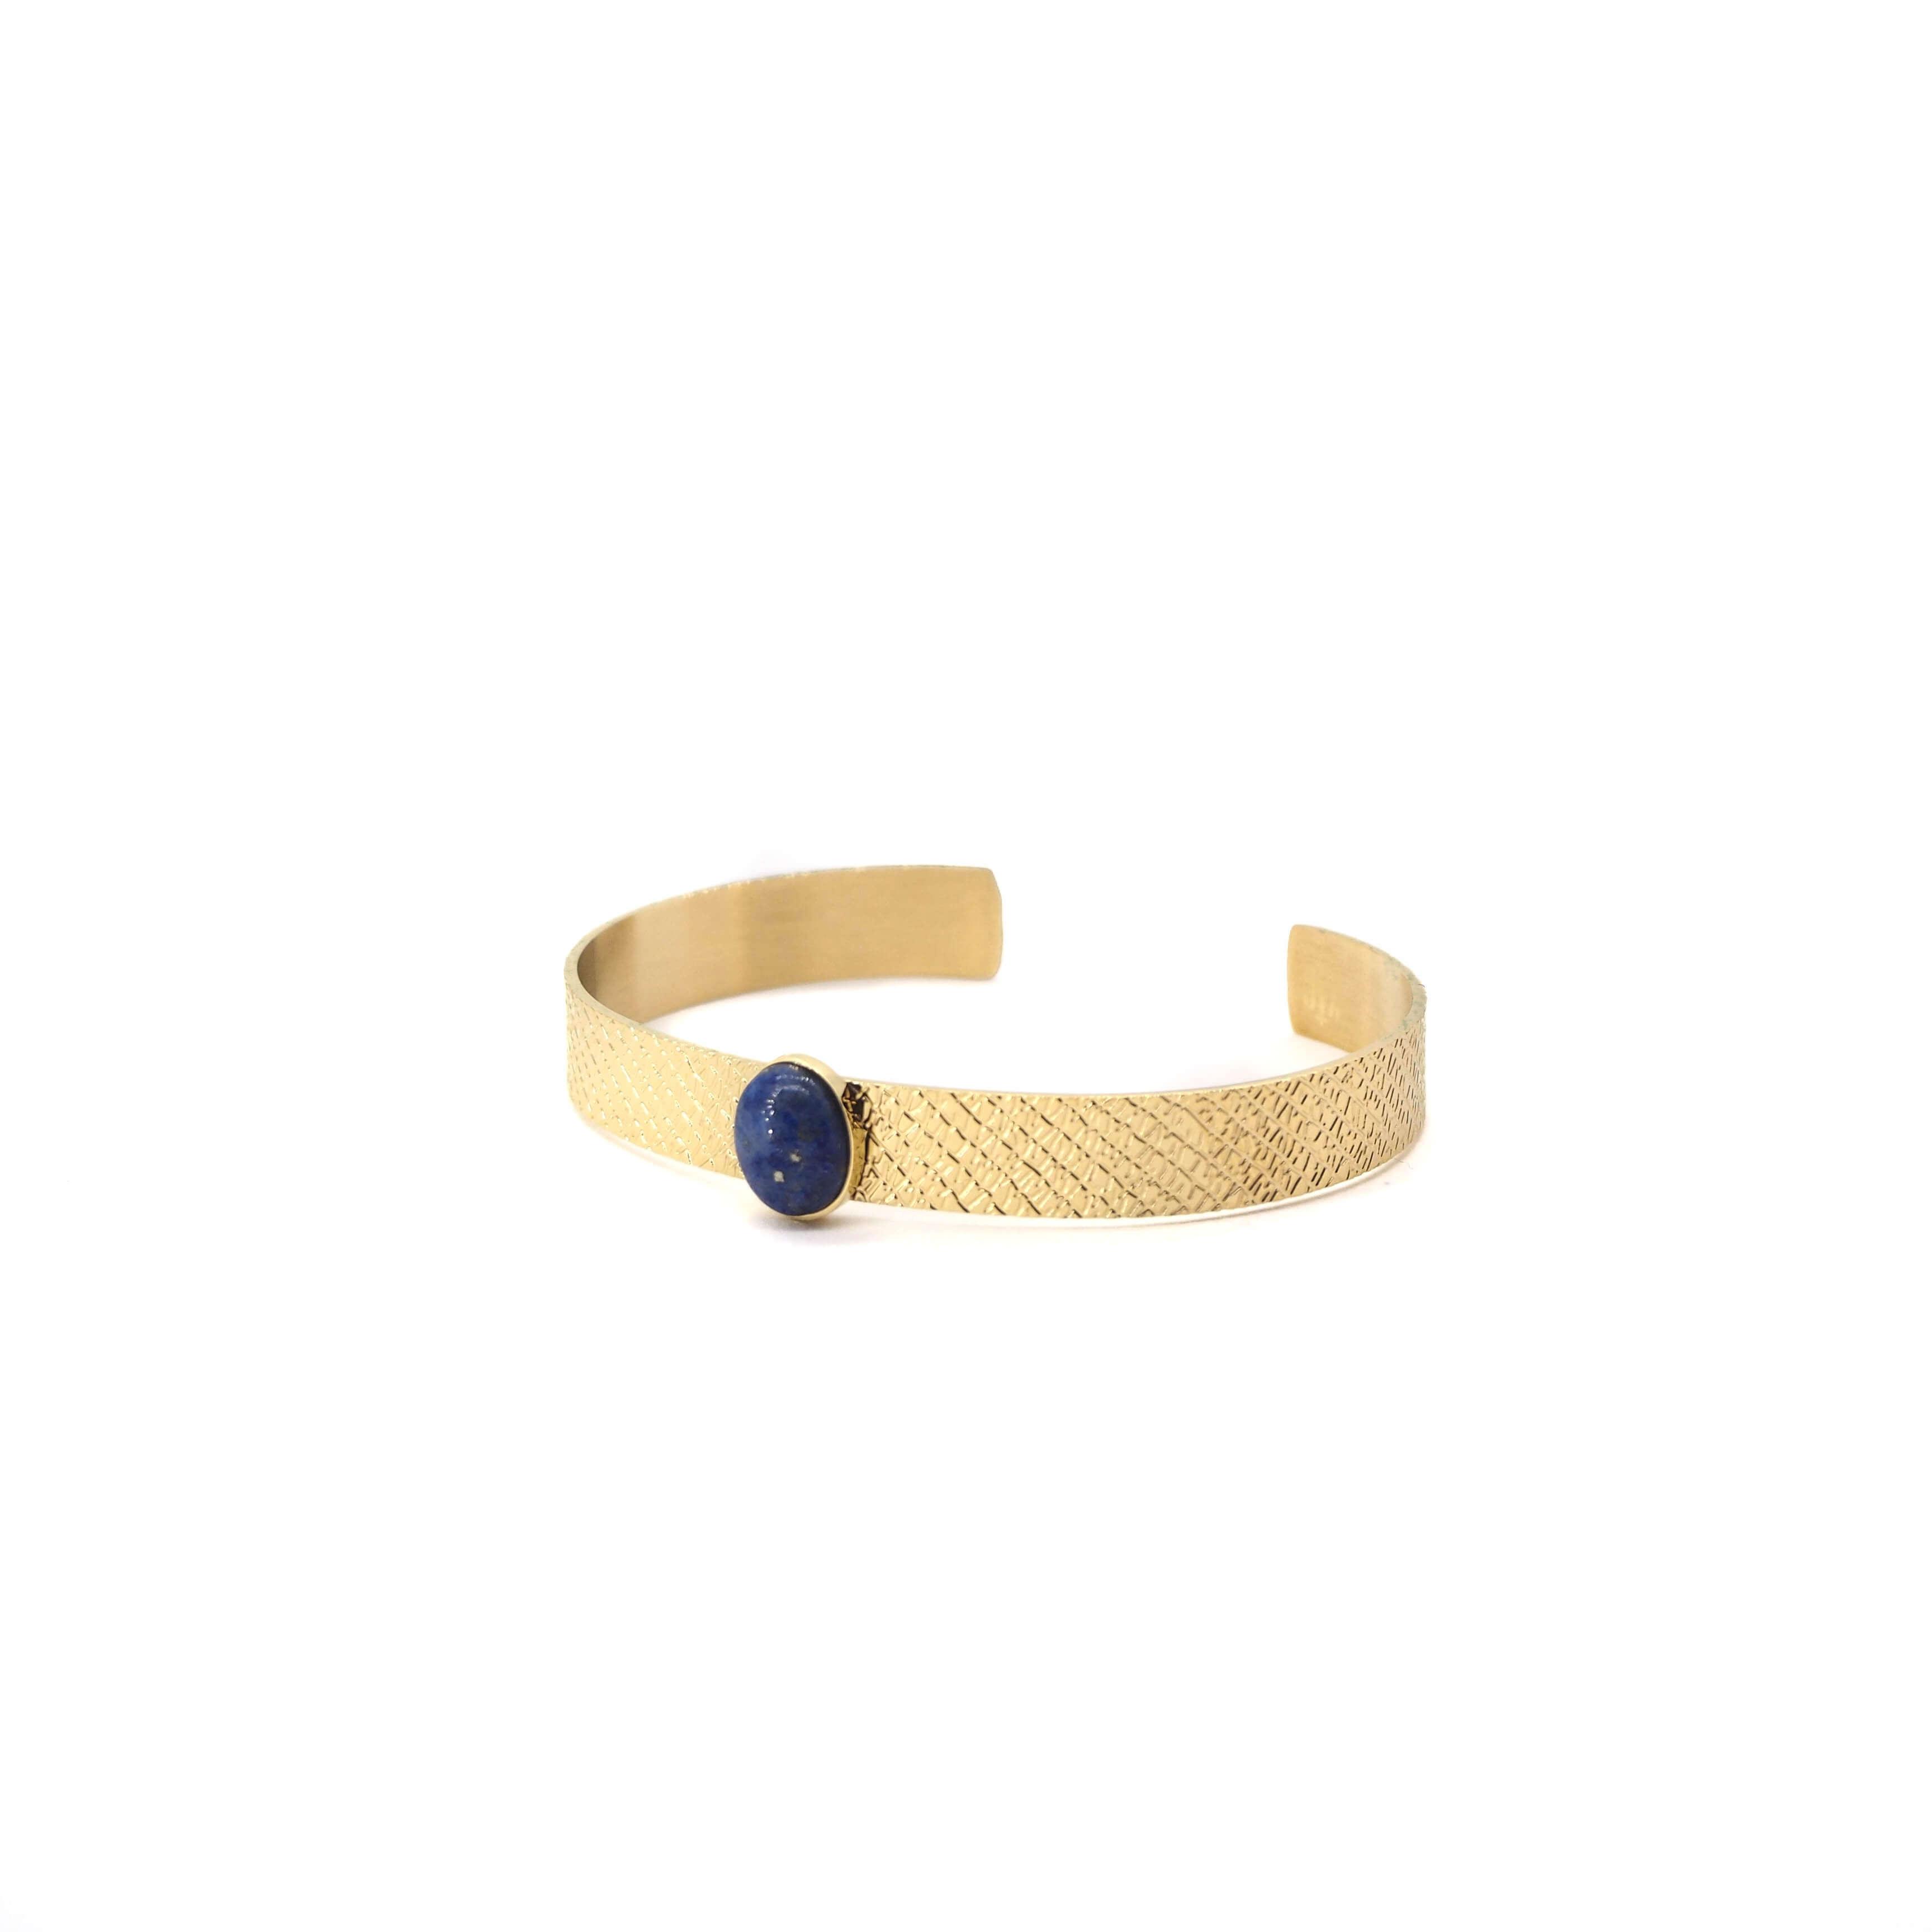 Jonc stone en acier jaune et lapis lazuli - Zag bijoux